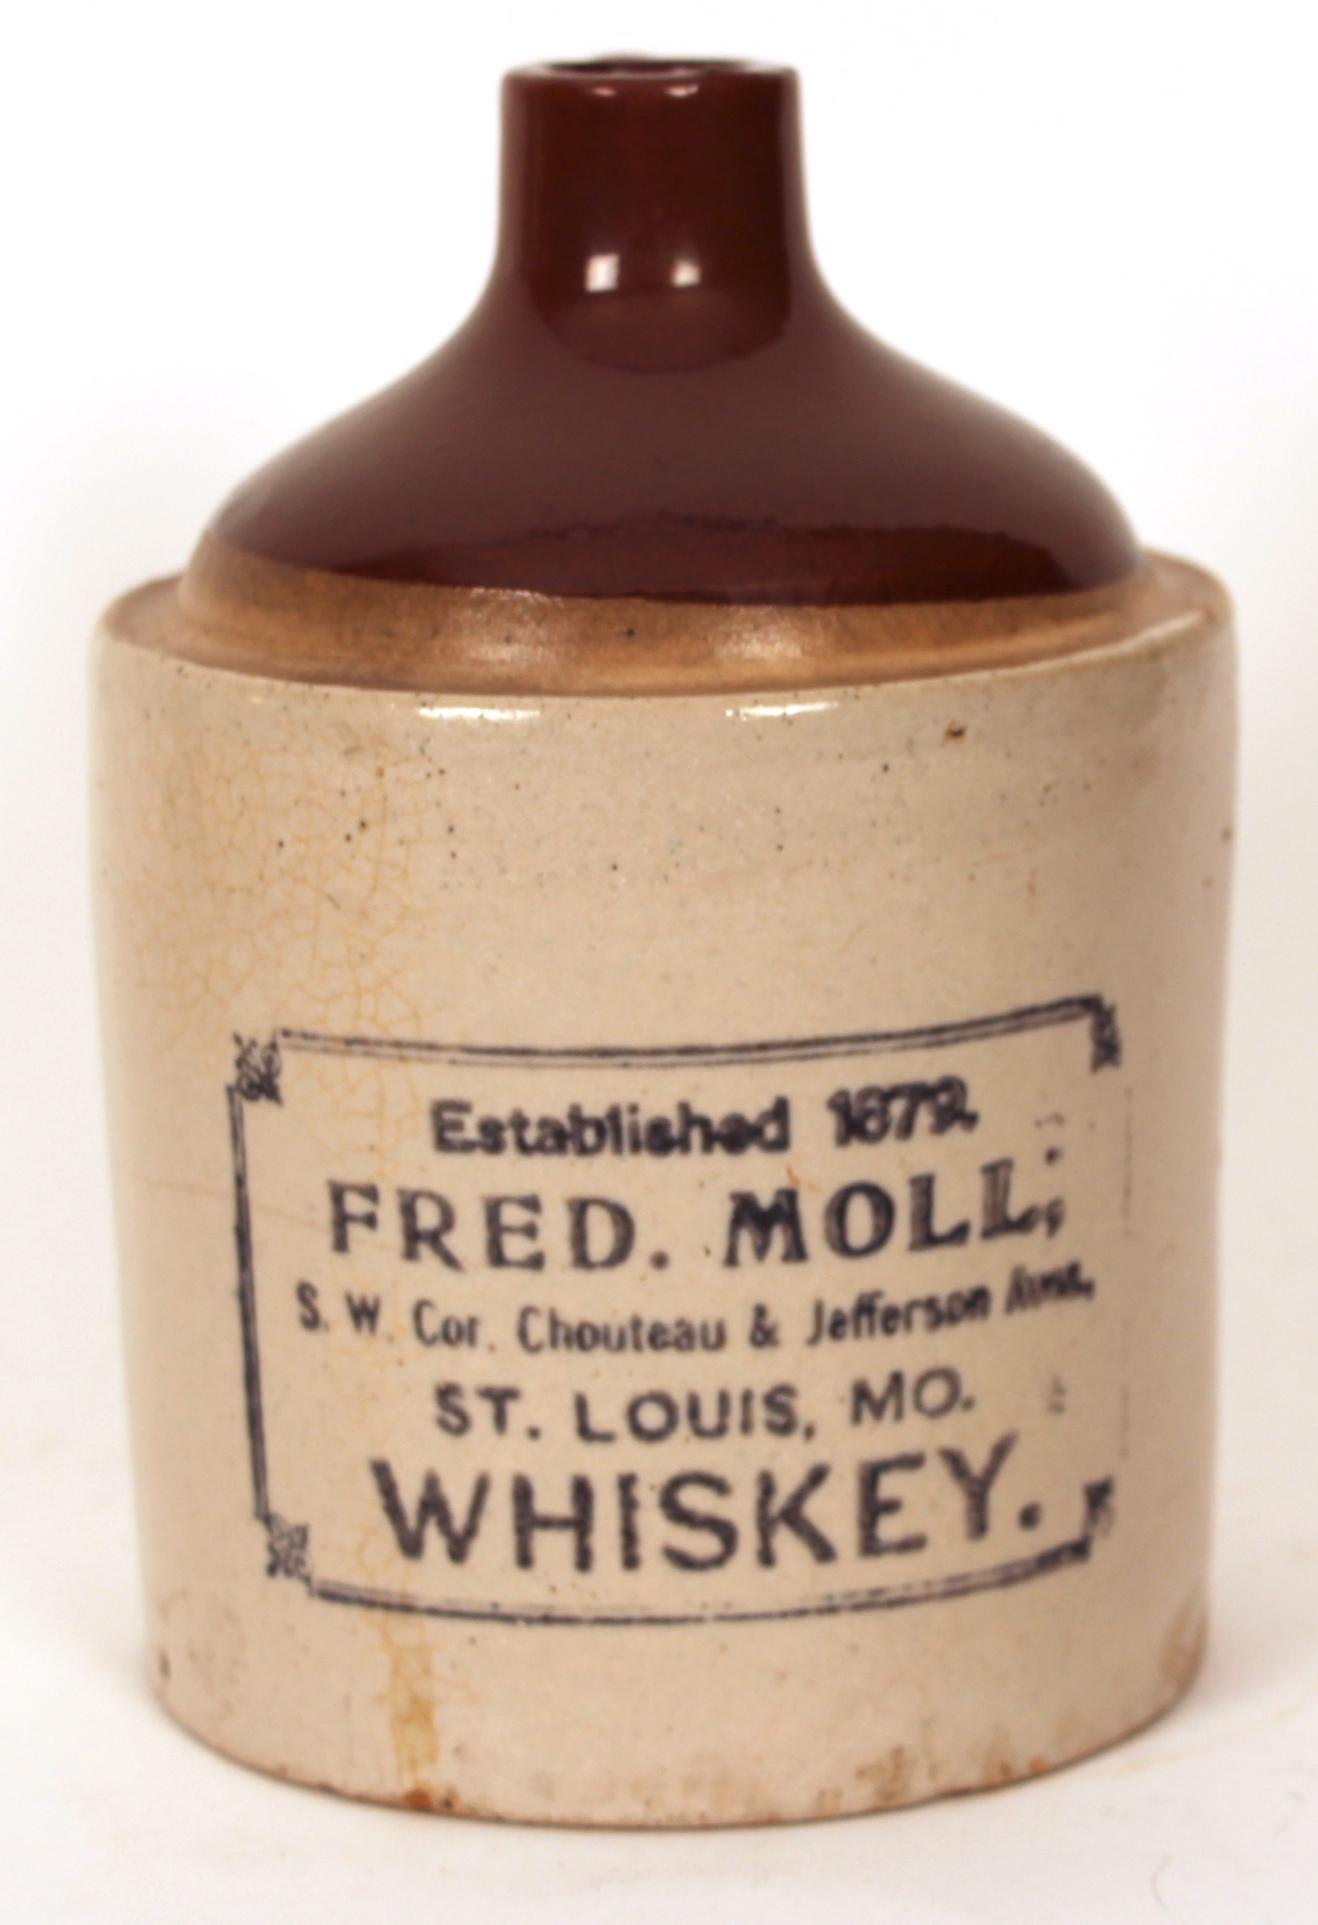 Fred Moll Whiskey Stoneware Jug, St. Louis, MO 1900